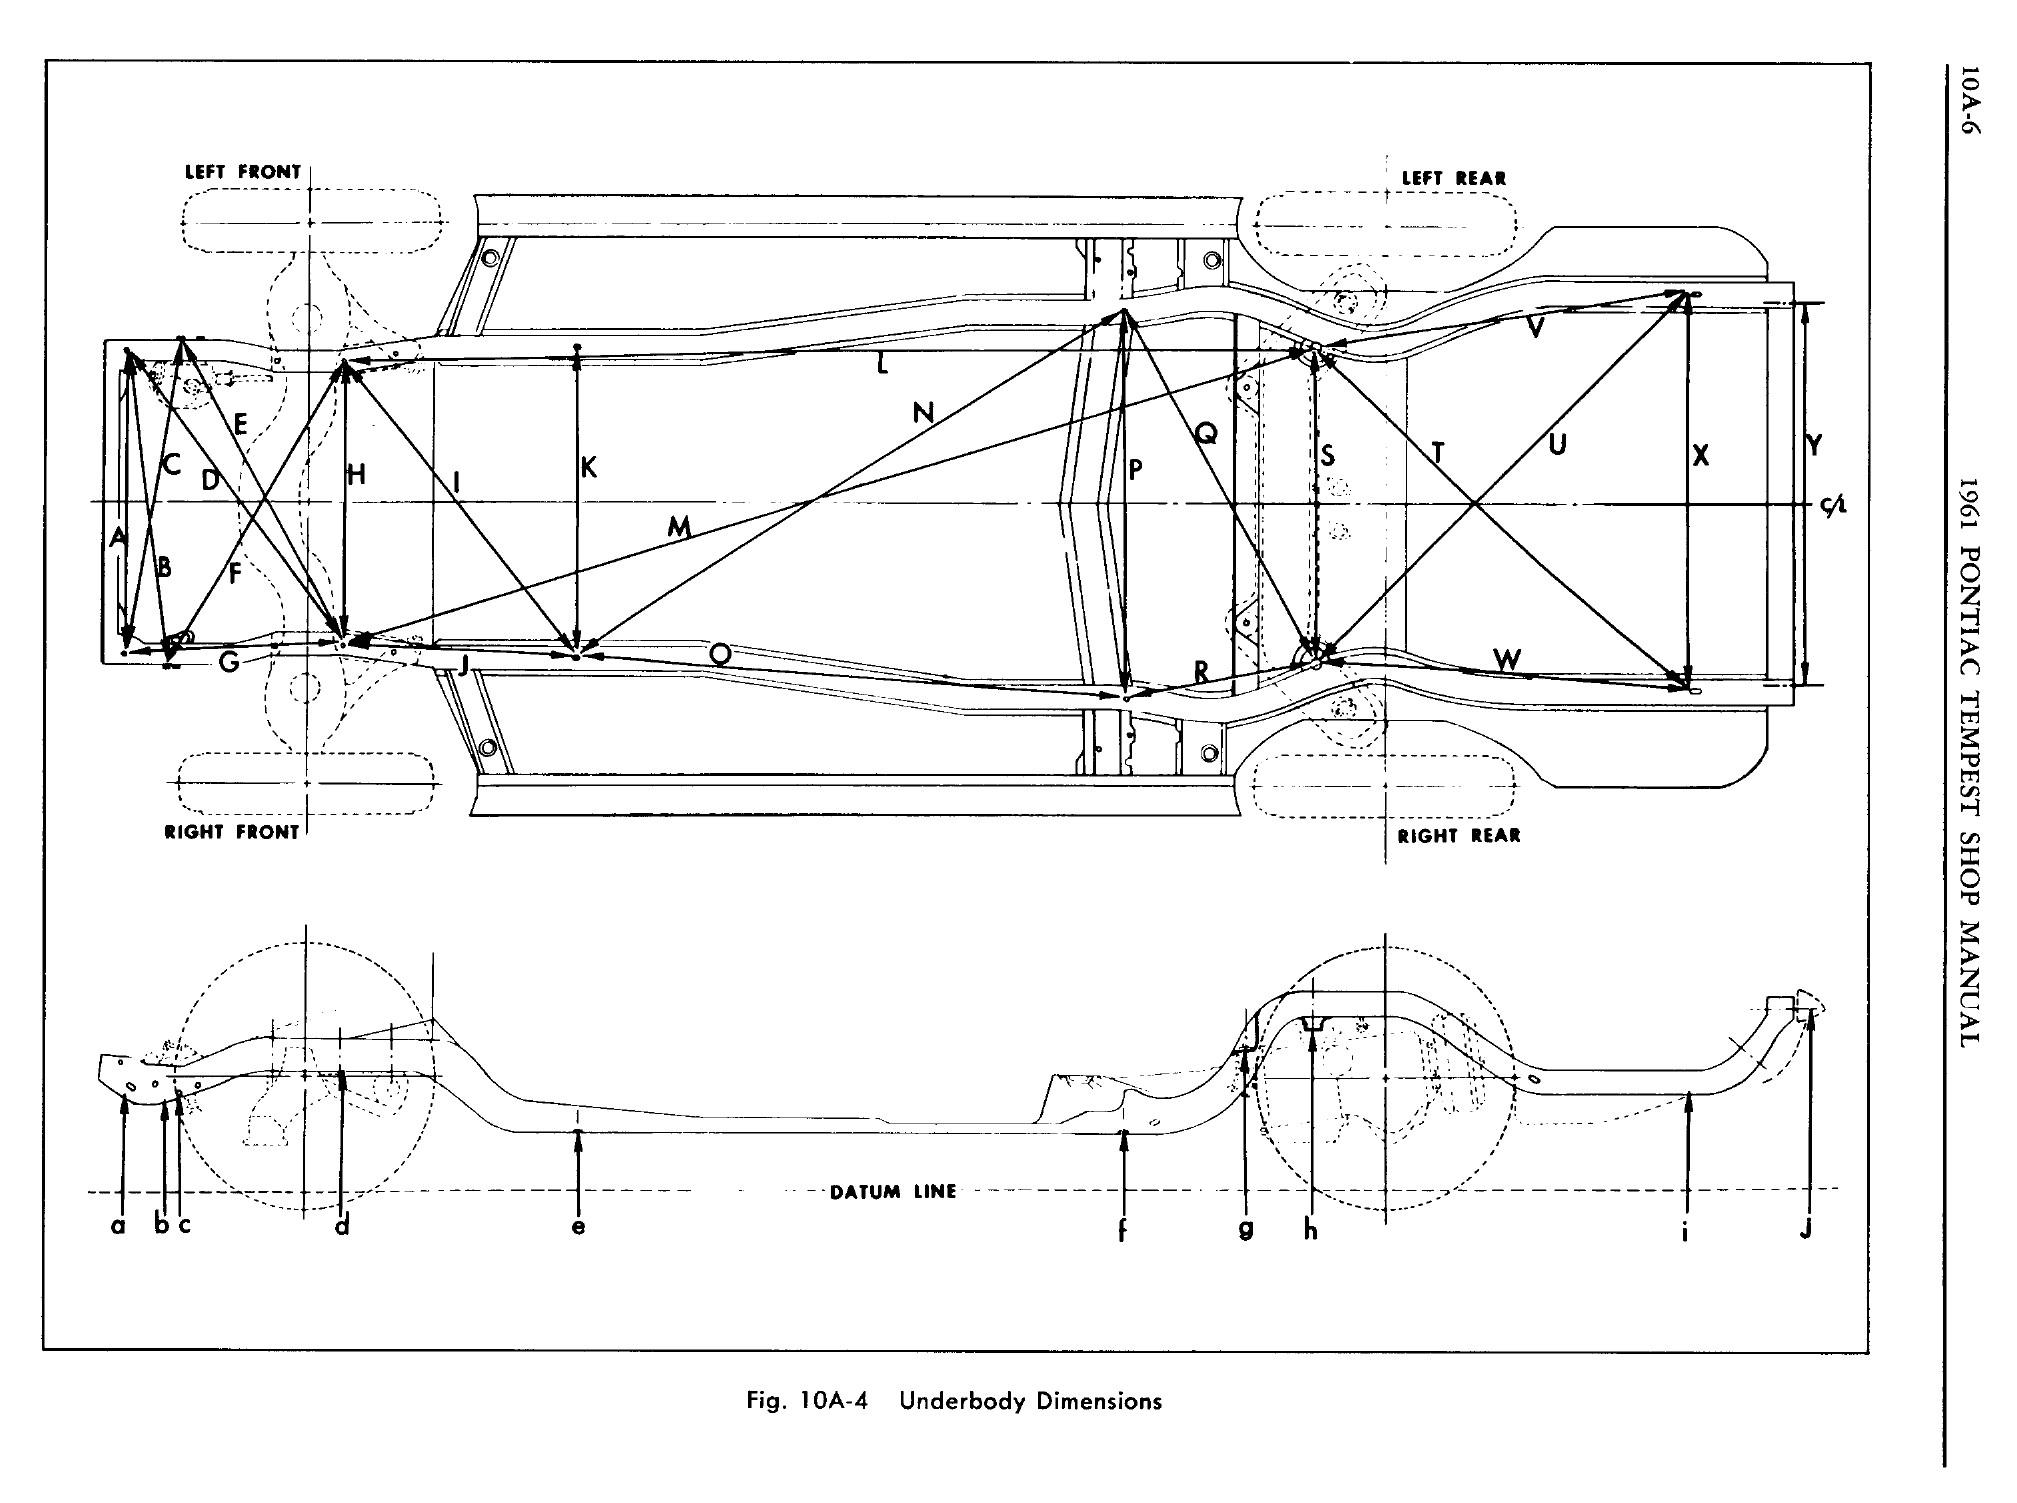 1961 Pontiac Tempest Shop Manual- Body Page 7 of 62